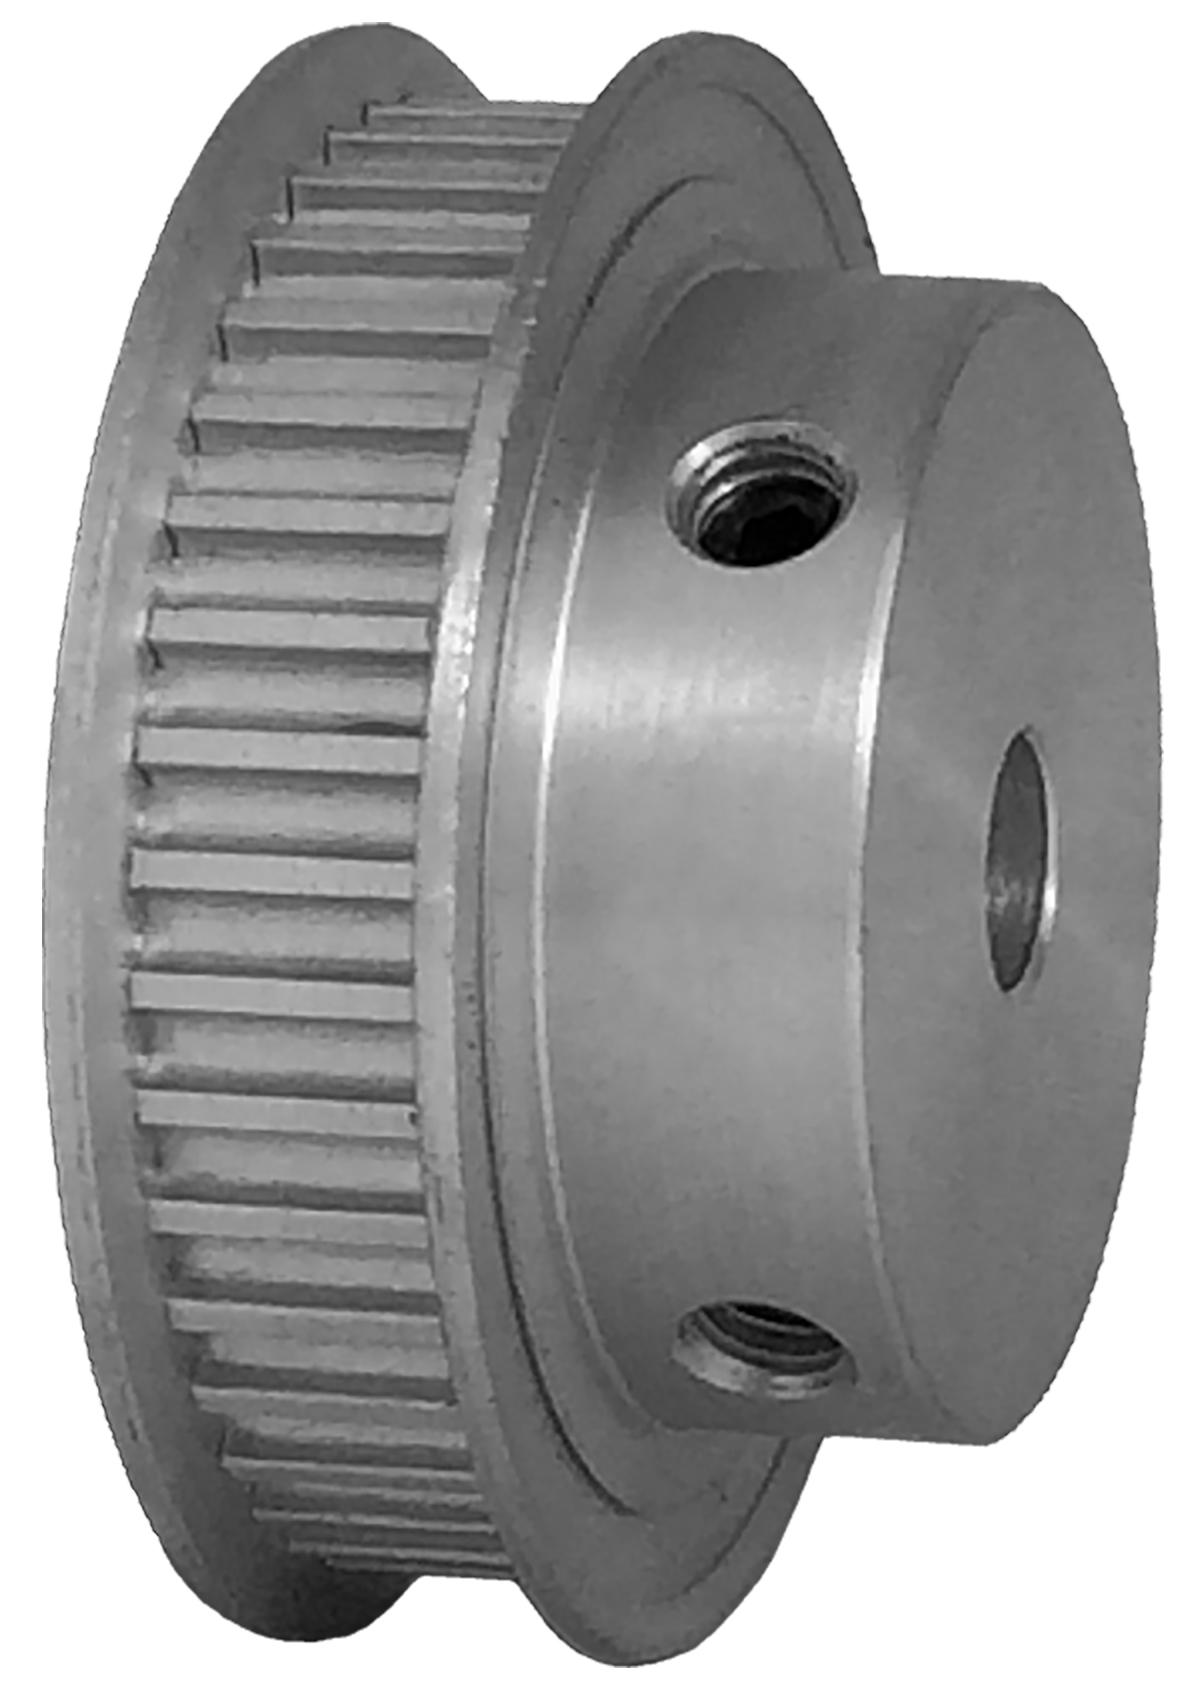 40-3M06-6FA3 - Aluminum Powerhouse®HTD® Pulleys